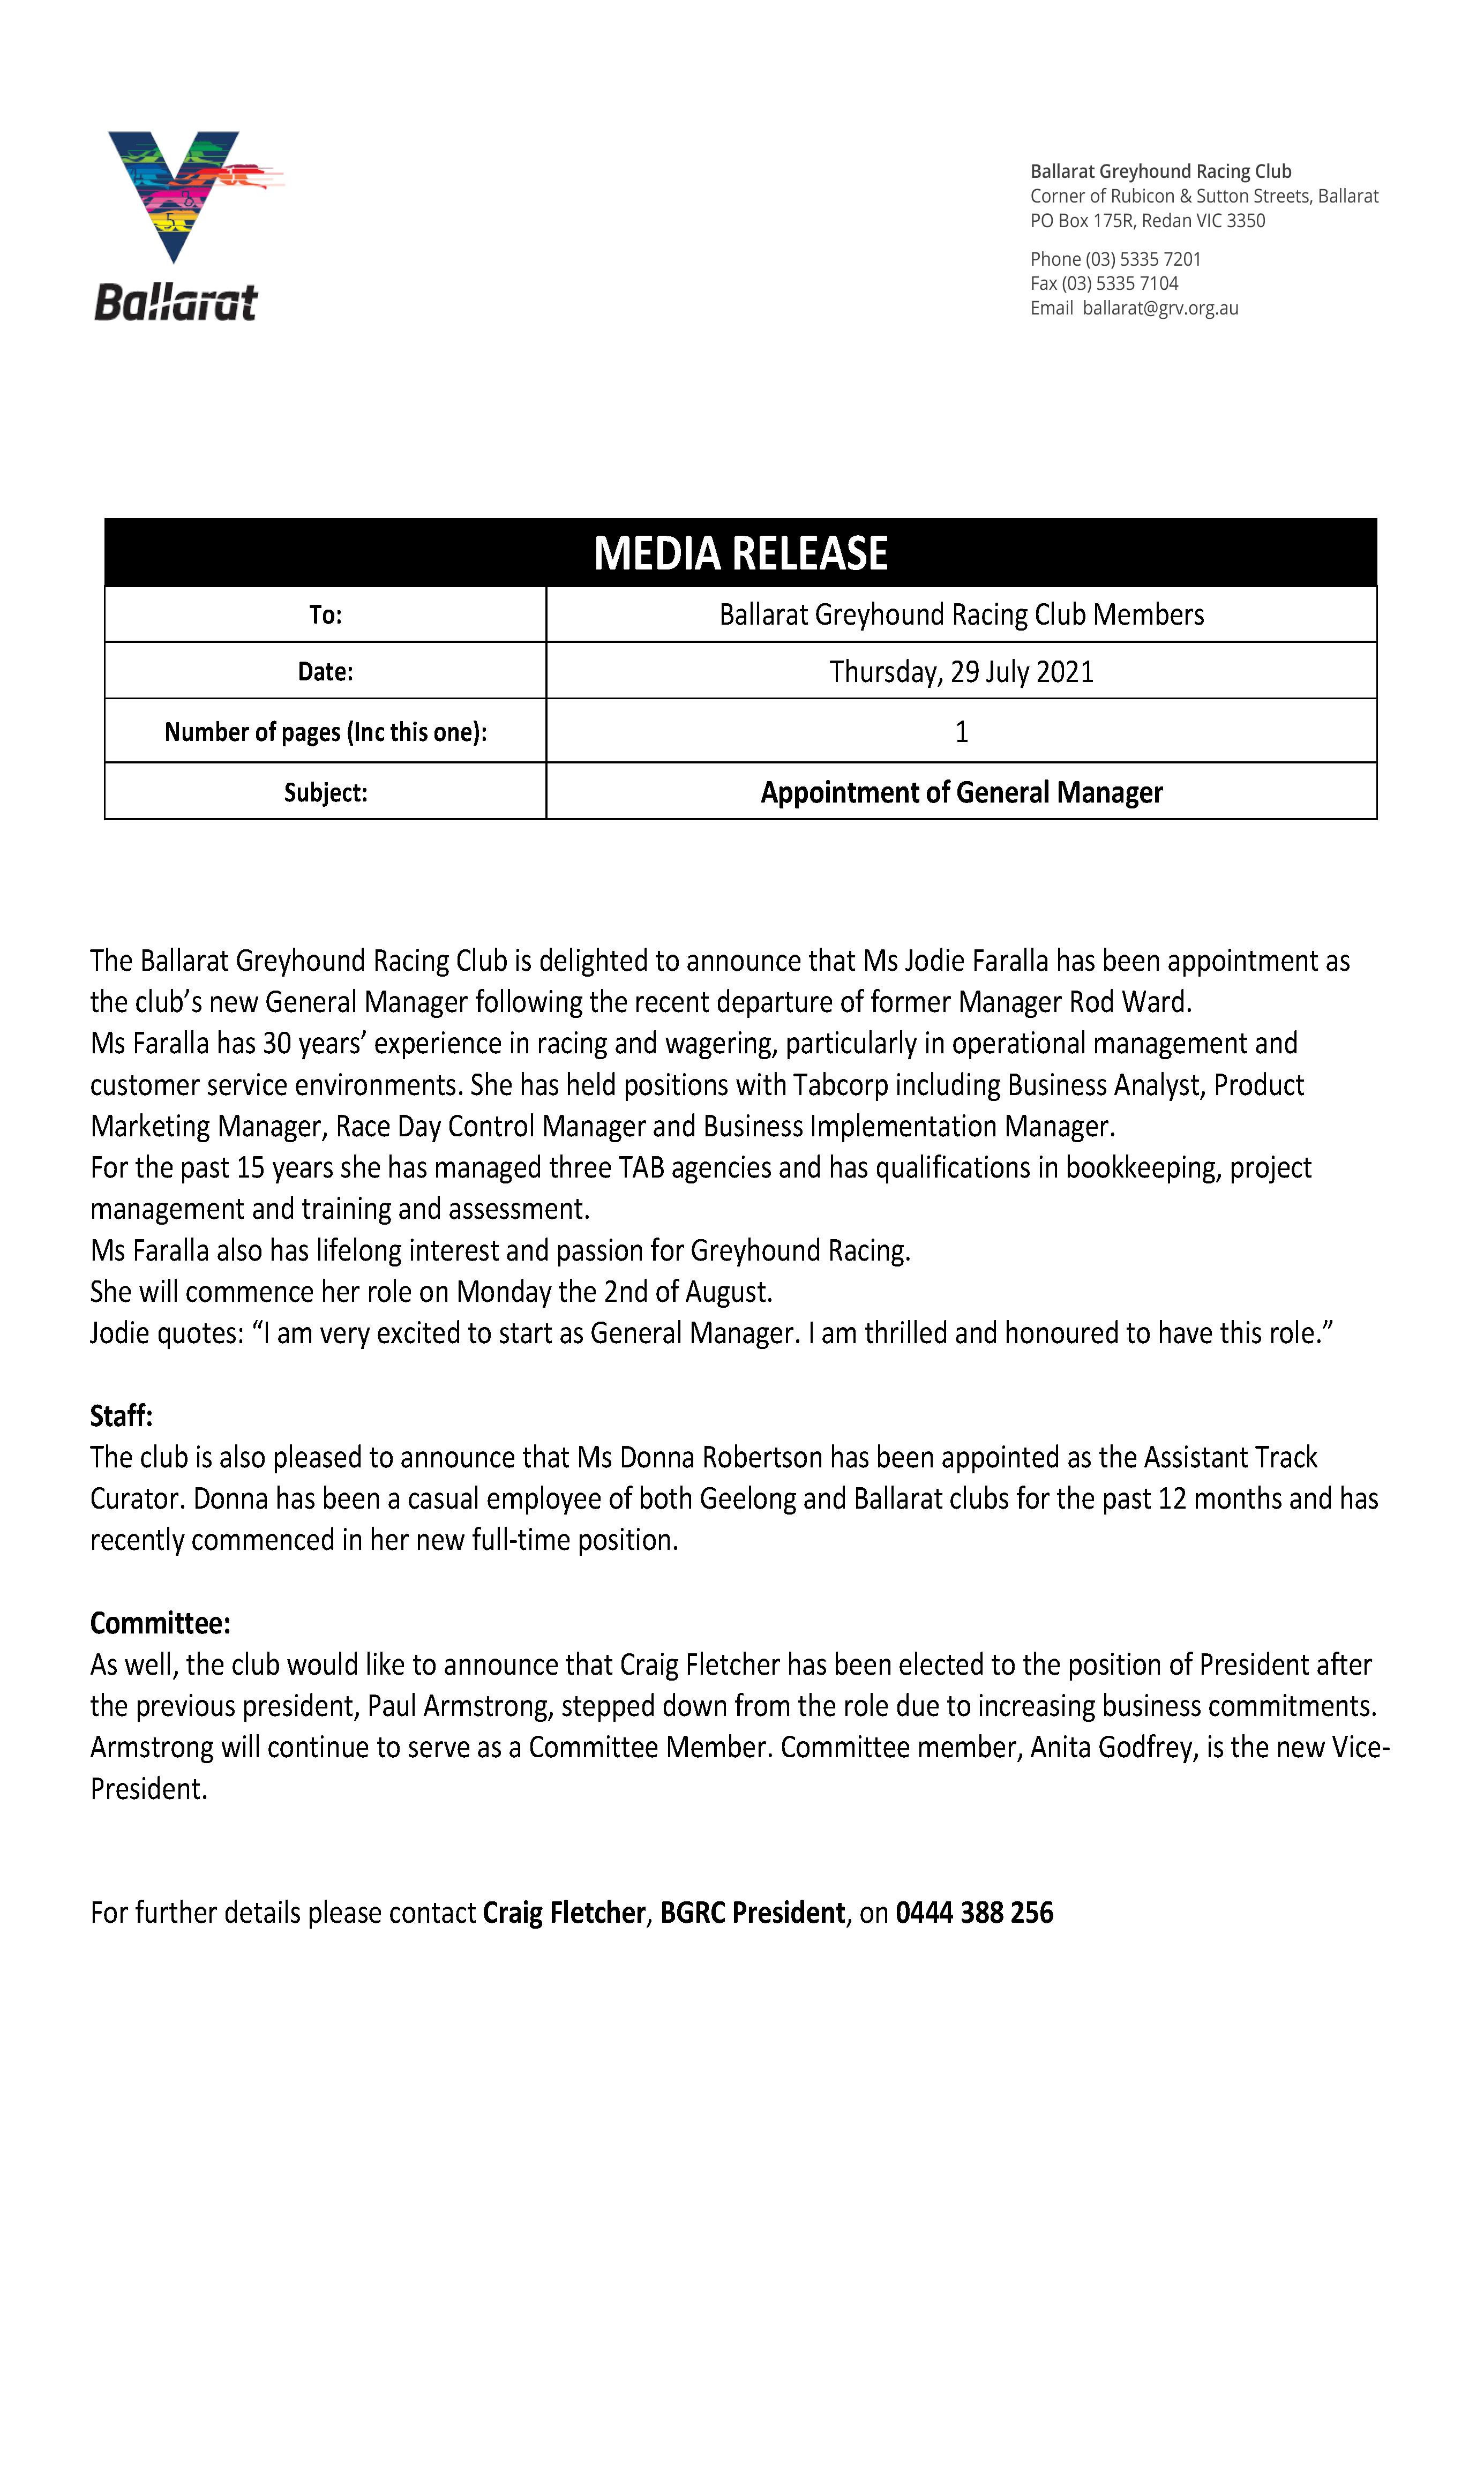 Media Release General Manager